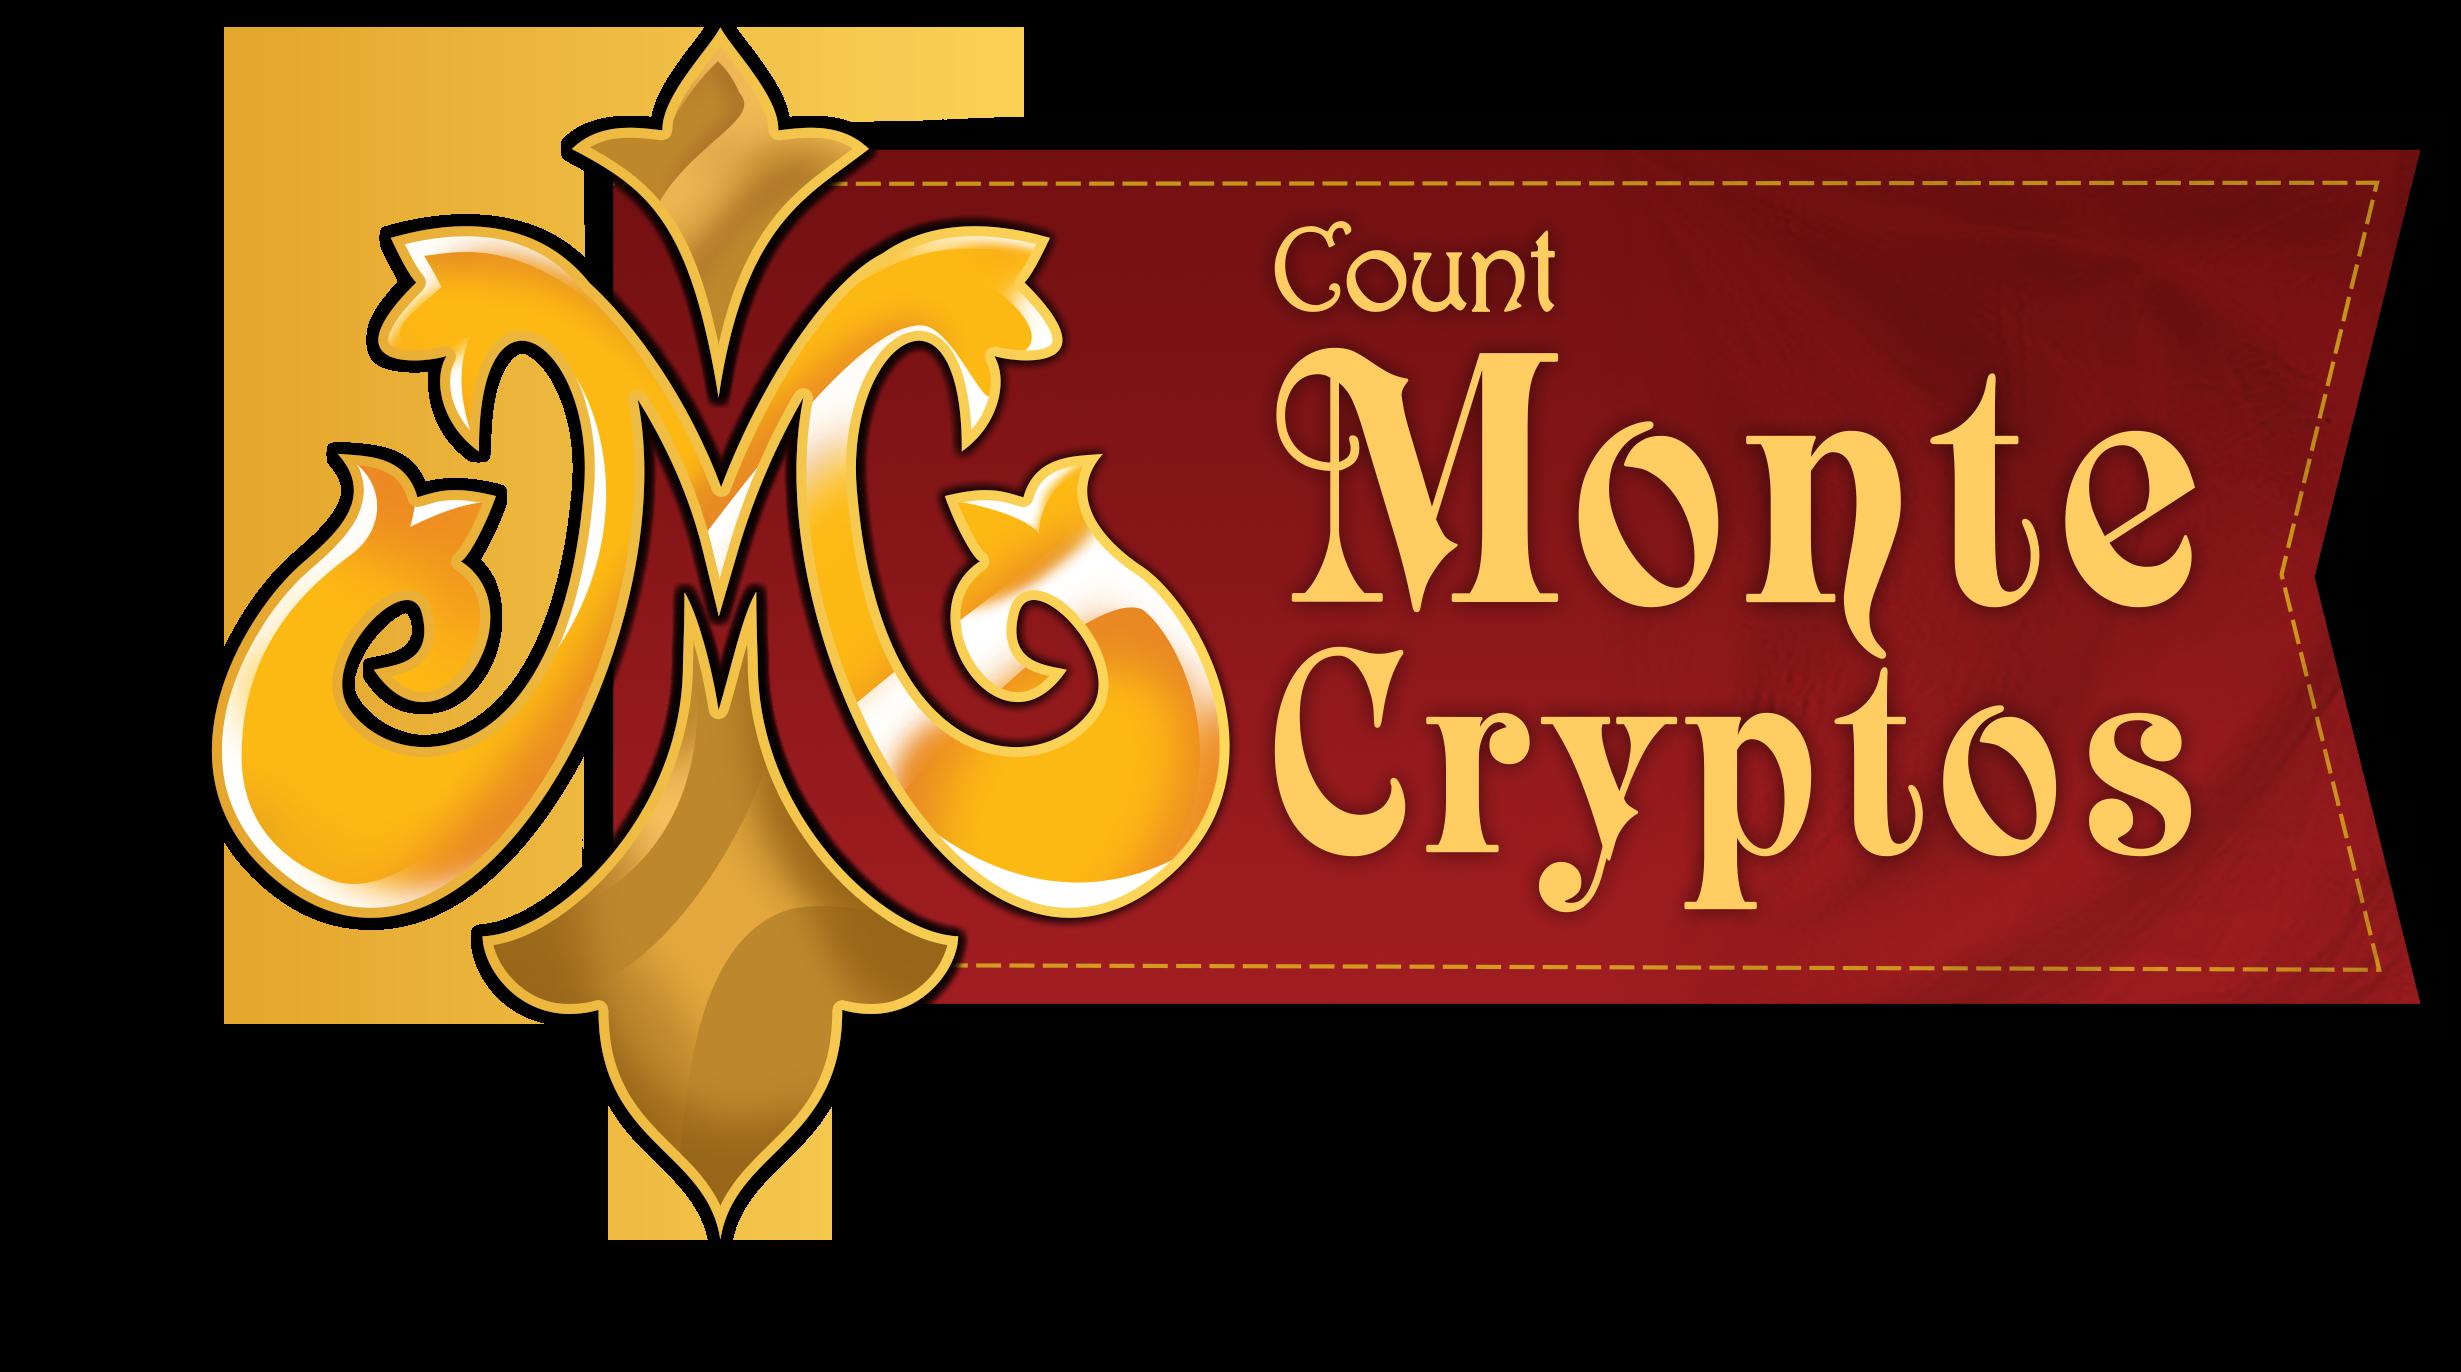 Montecrysto casino